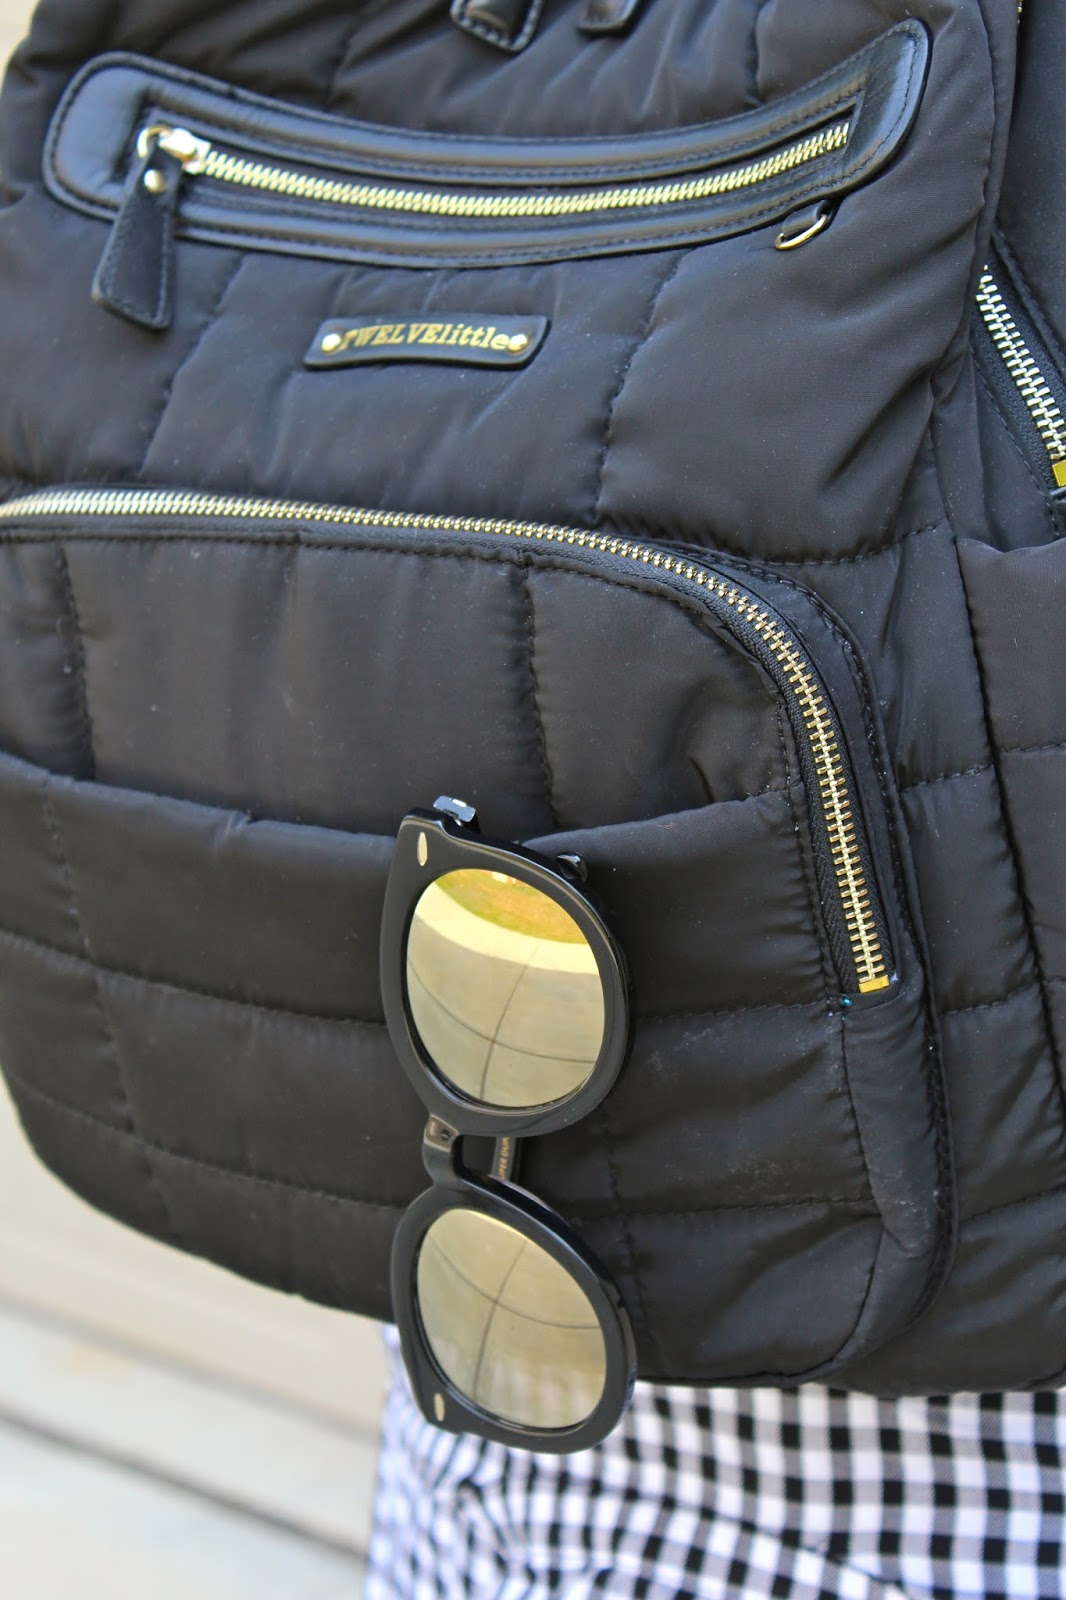 TWELVElittle Diaper Bag Backpack